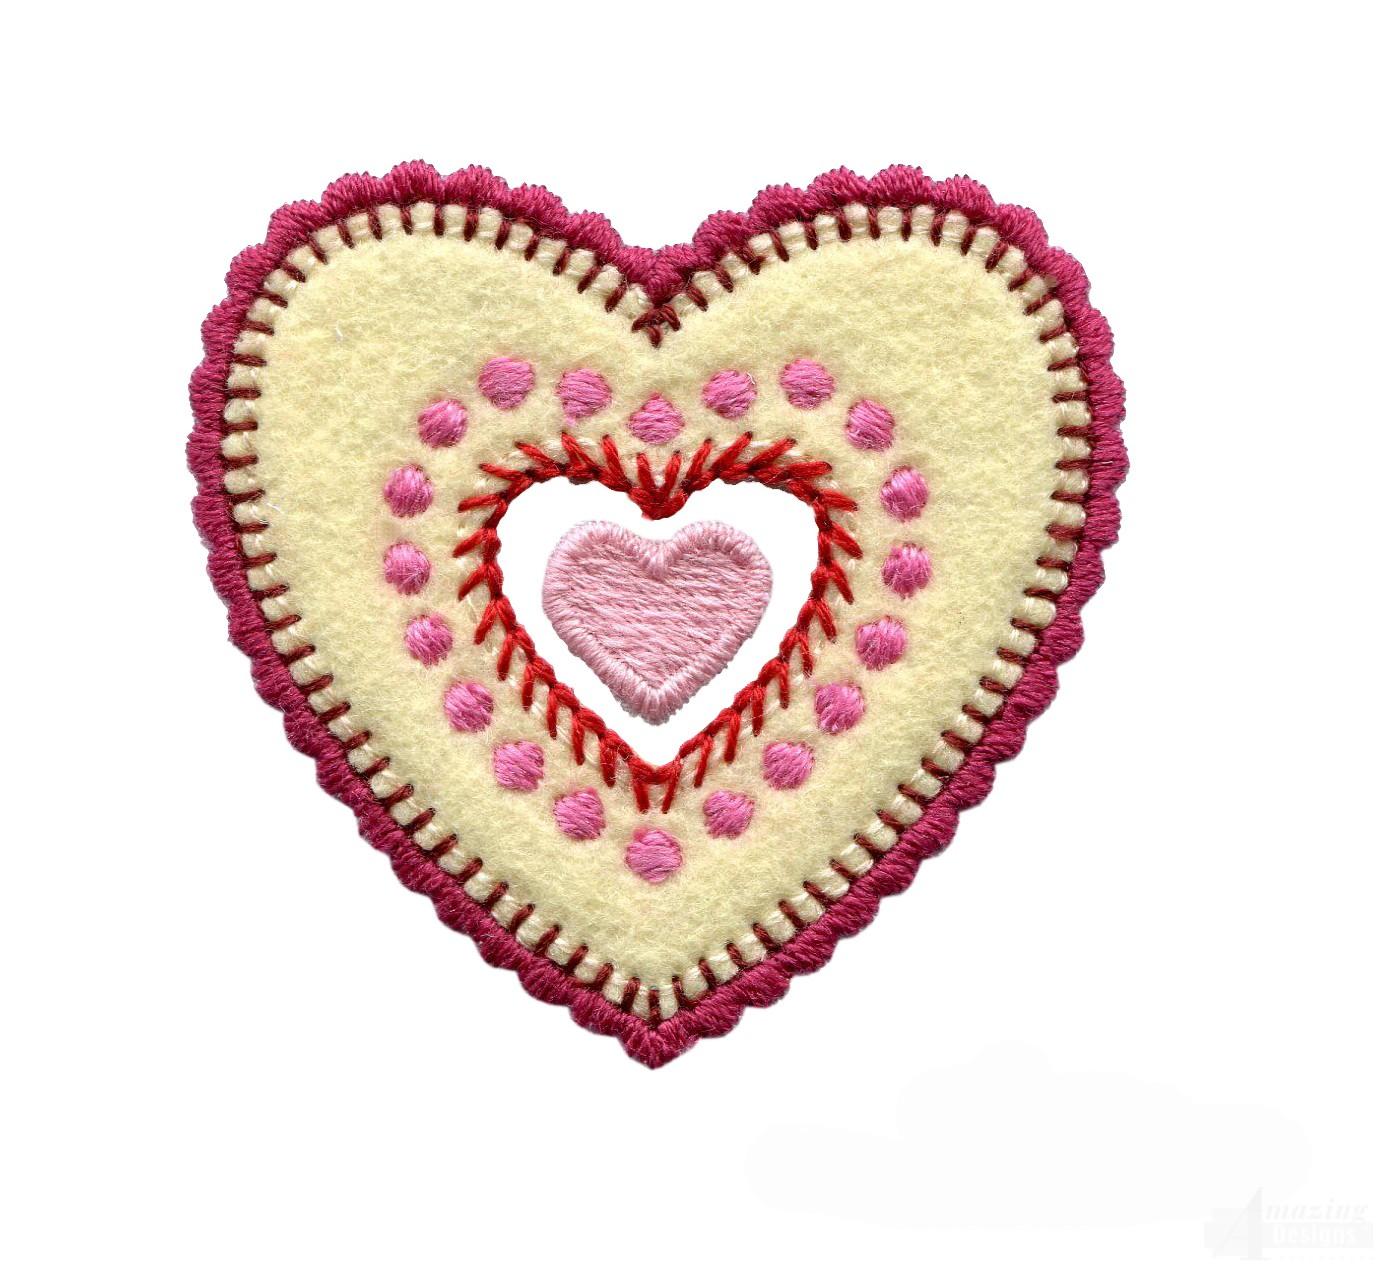 Layered hearts folk art embroidery design